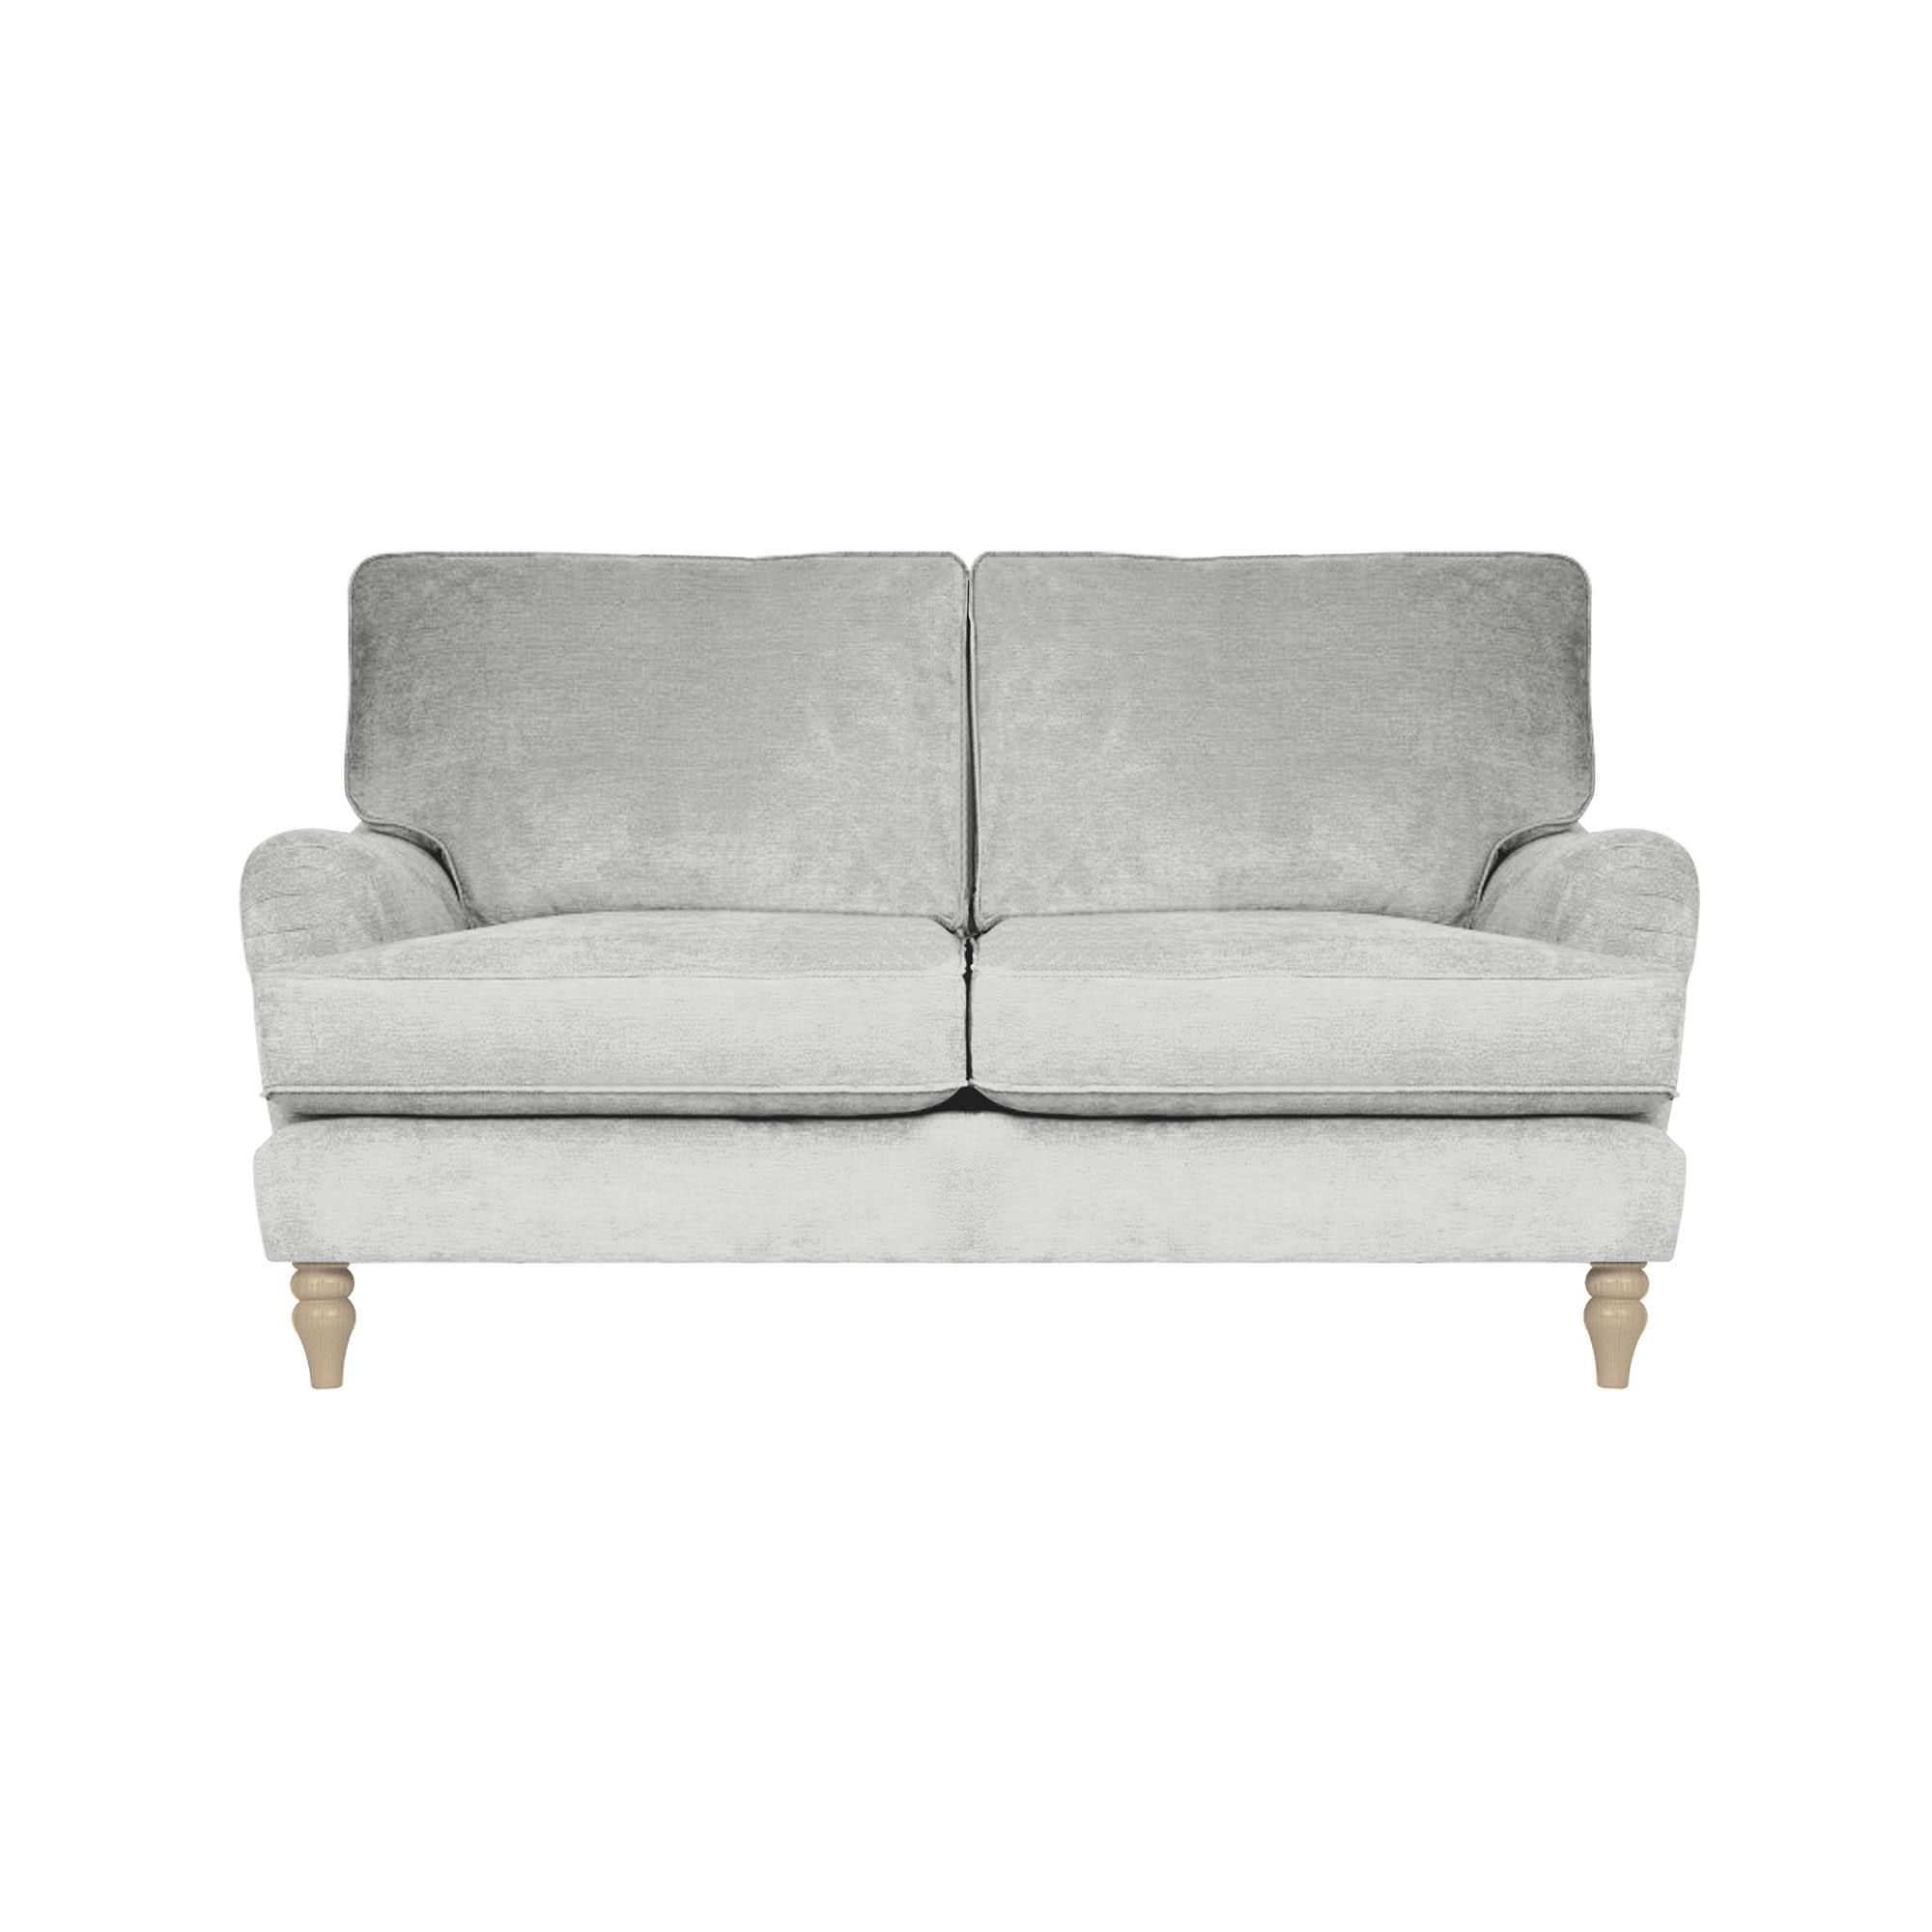 small sofas bella 2 seater sofa FBKTWUD